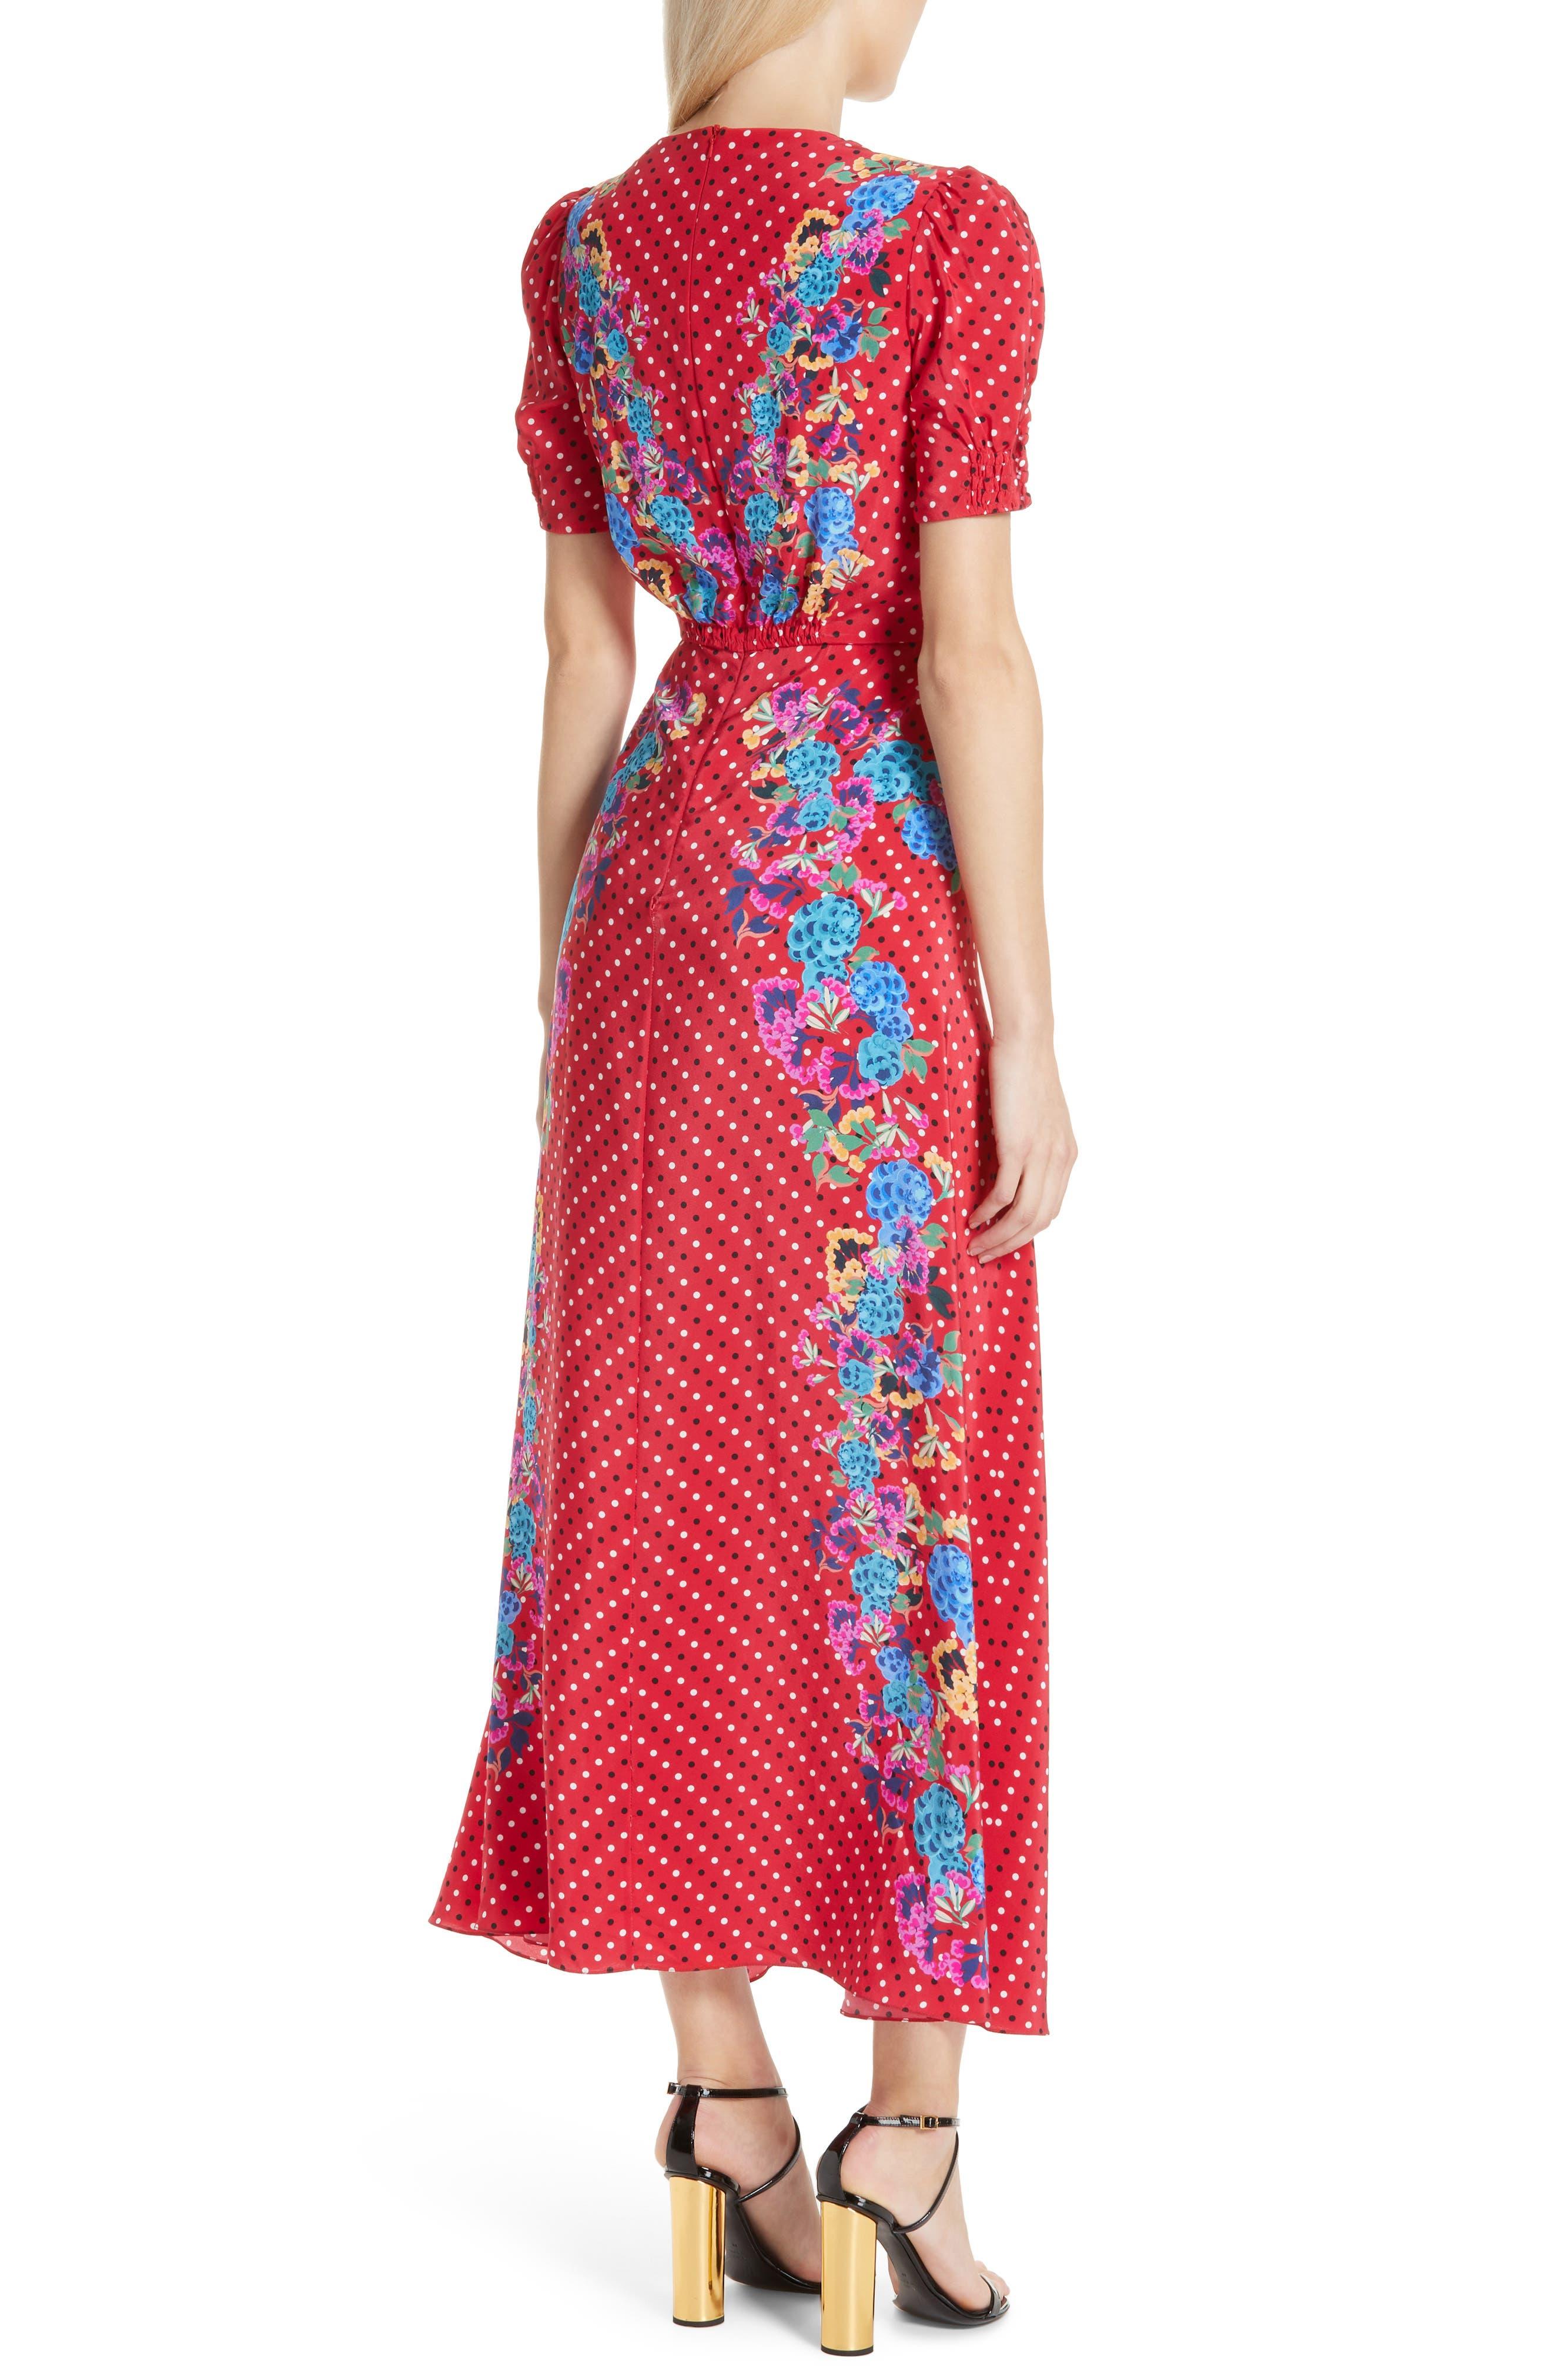 SALONI, Lea Print Silk Maxi Dress, Alternate thumbnail 2, color, SCARLET POLKA DOT